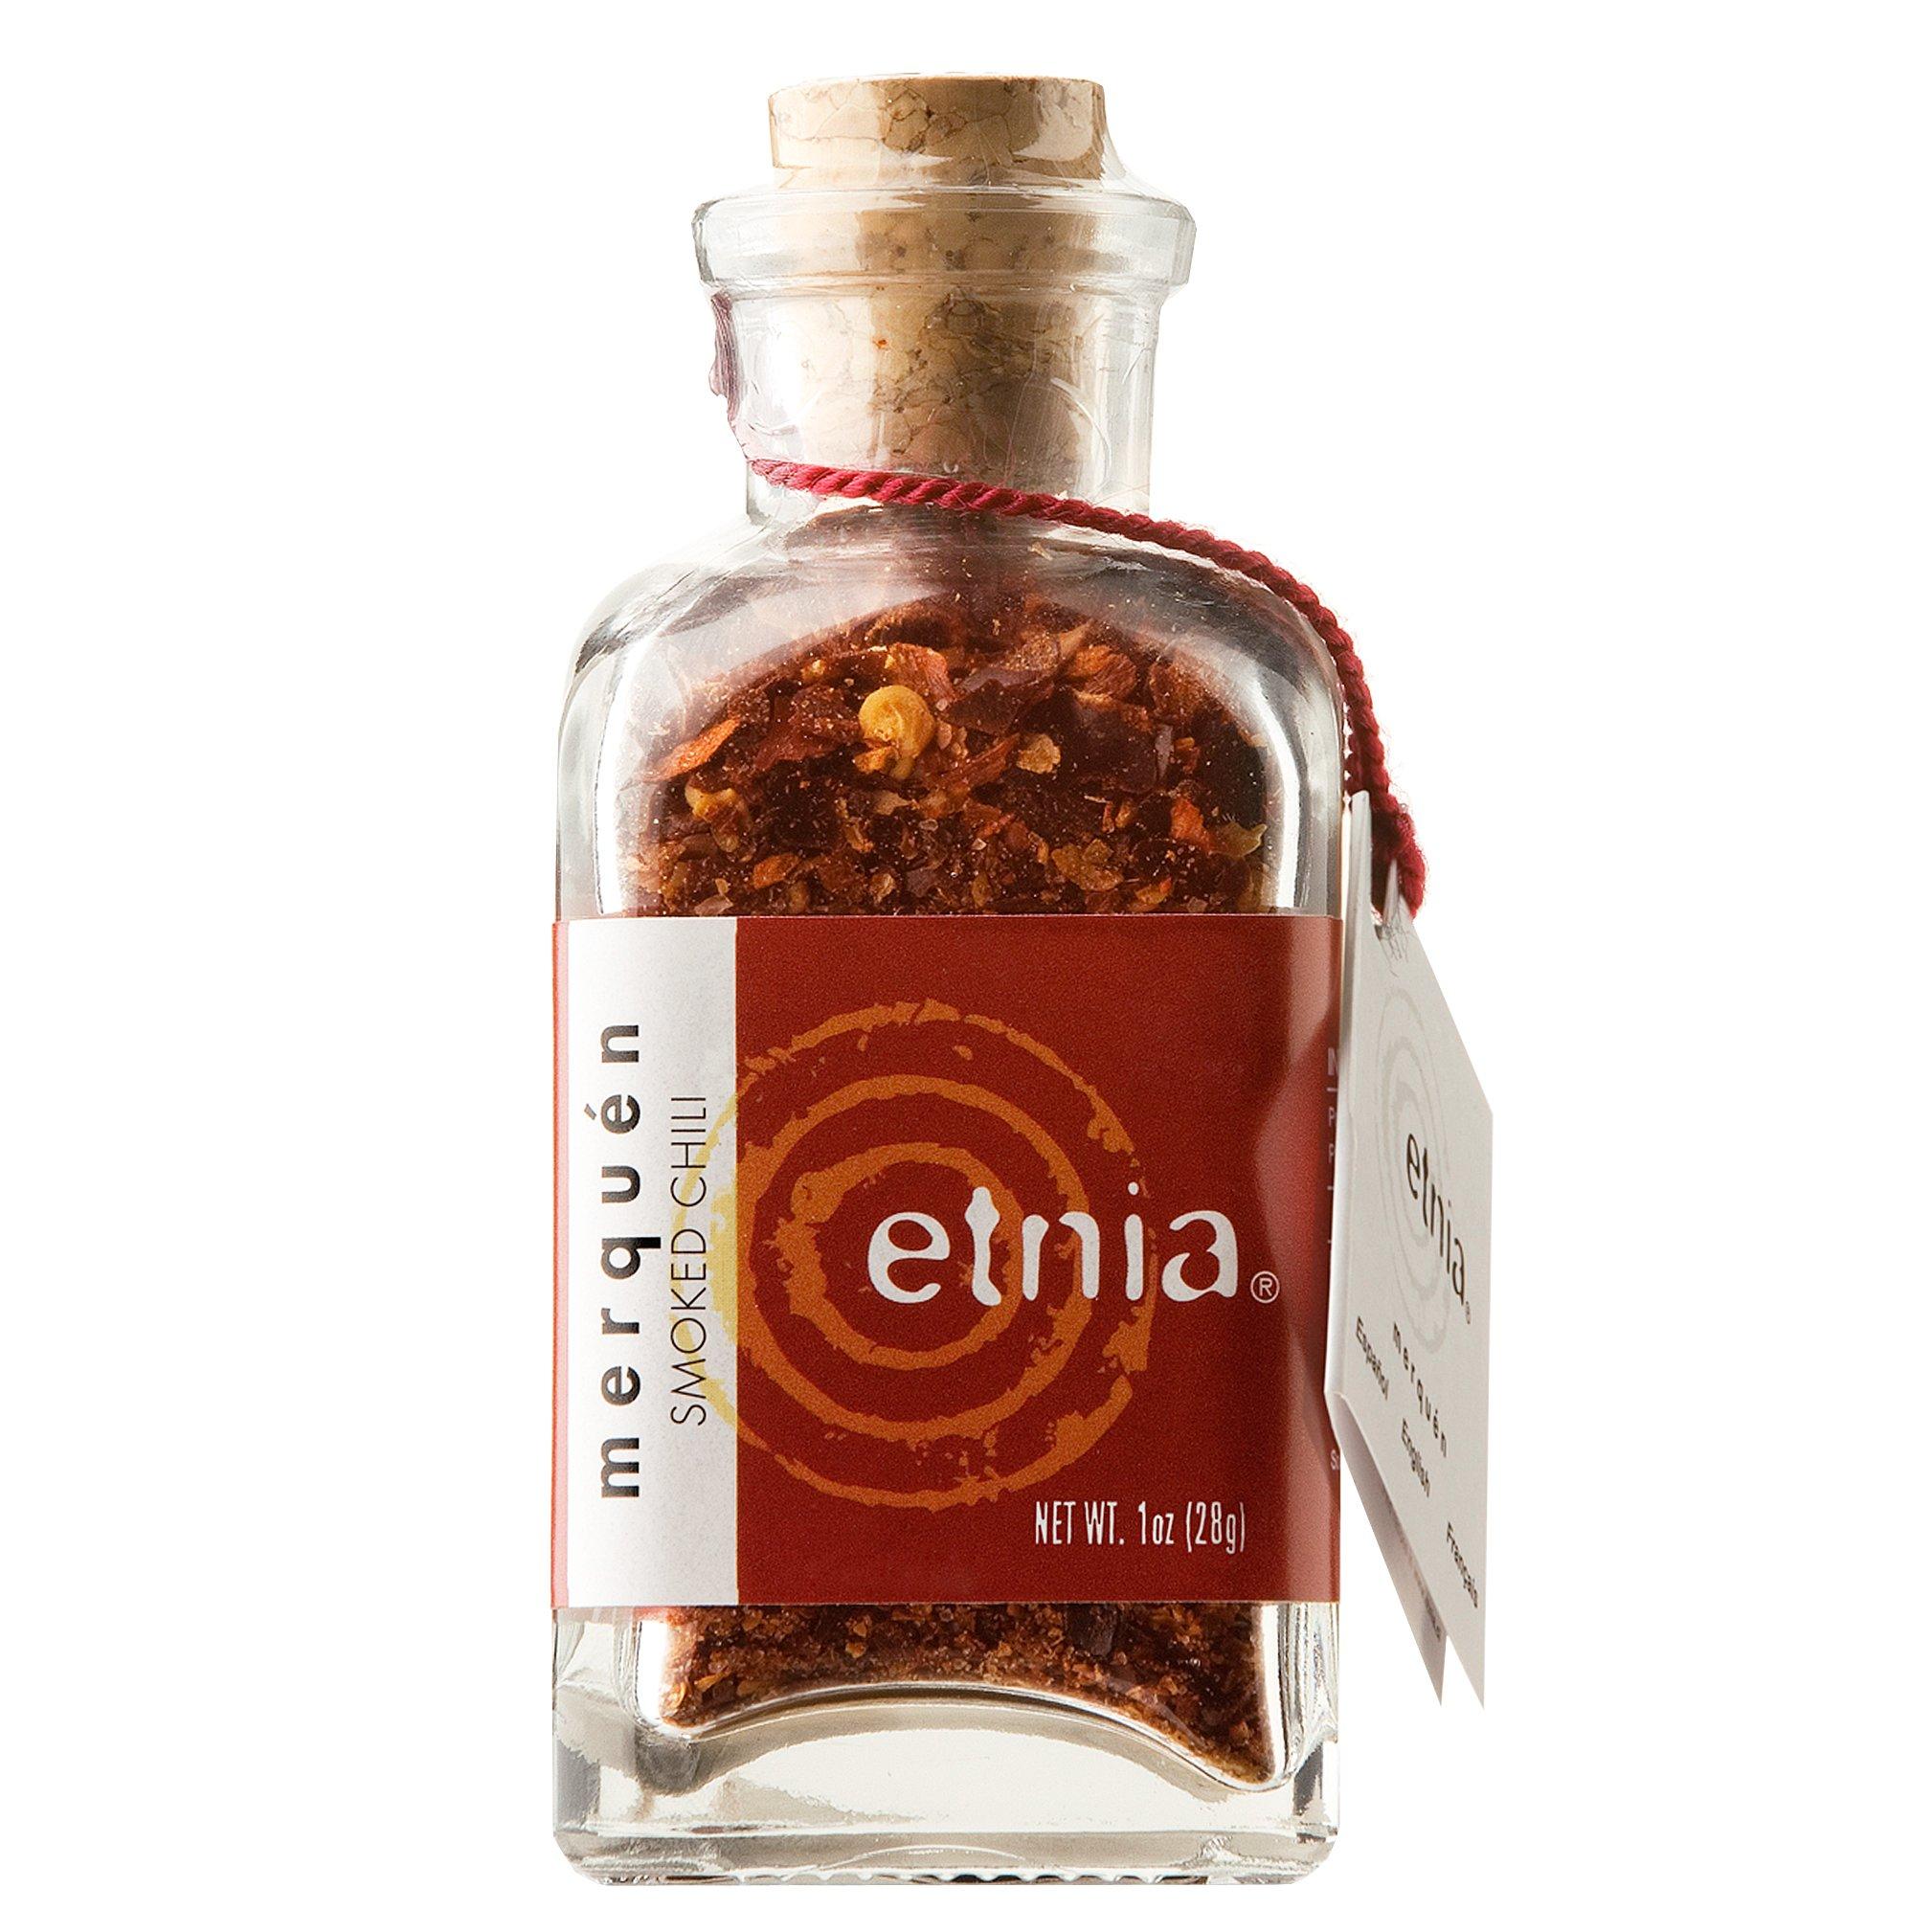 Etnia Chilean Merquen Smoked Chili Corked Bottle, Sea Salt, 1 Ounce